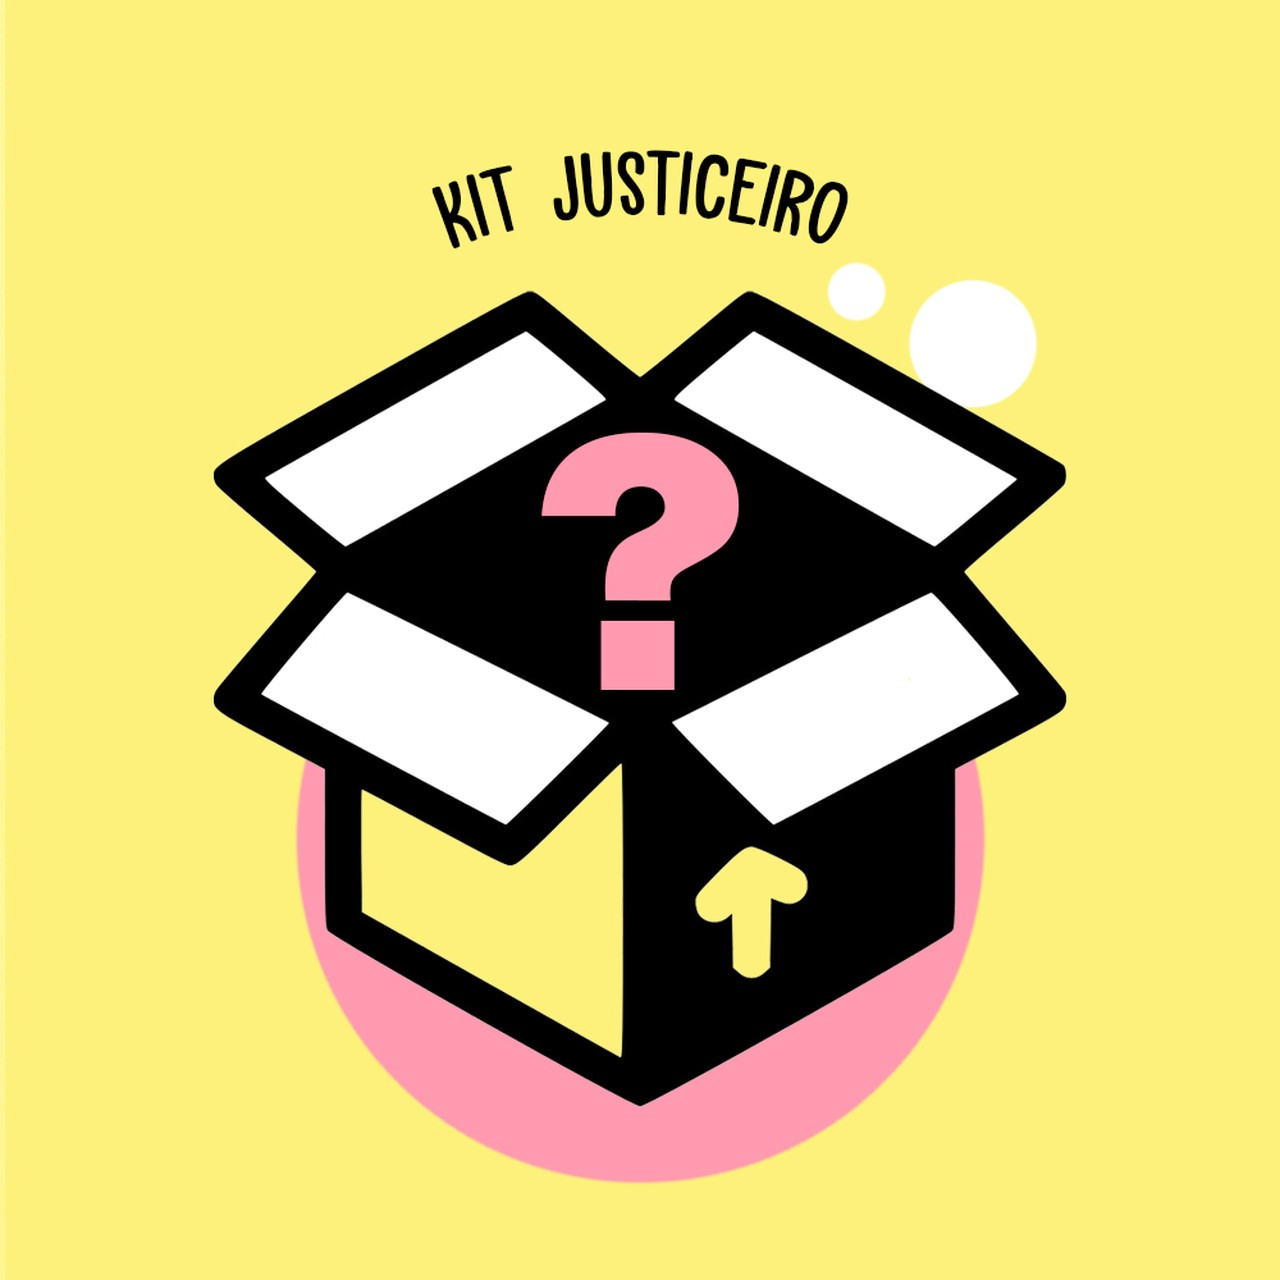 Kit Justiceiro